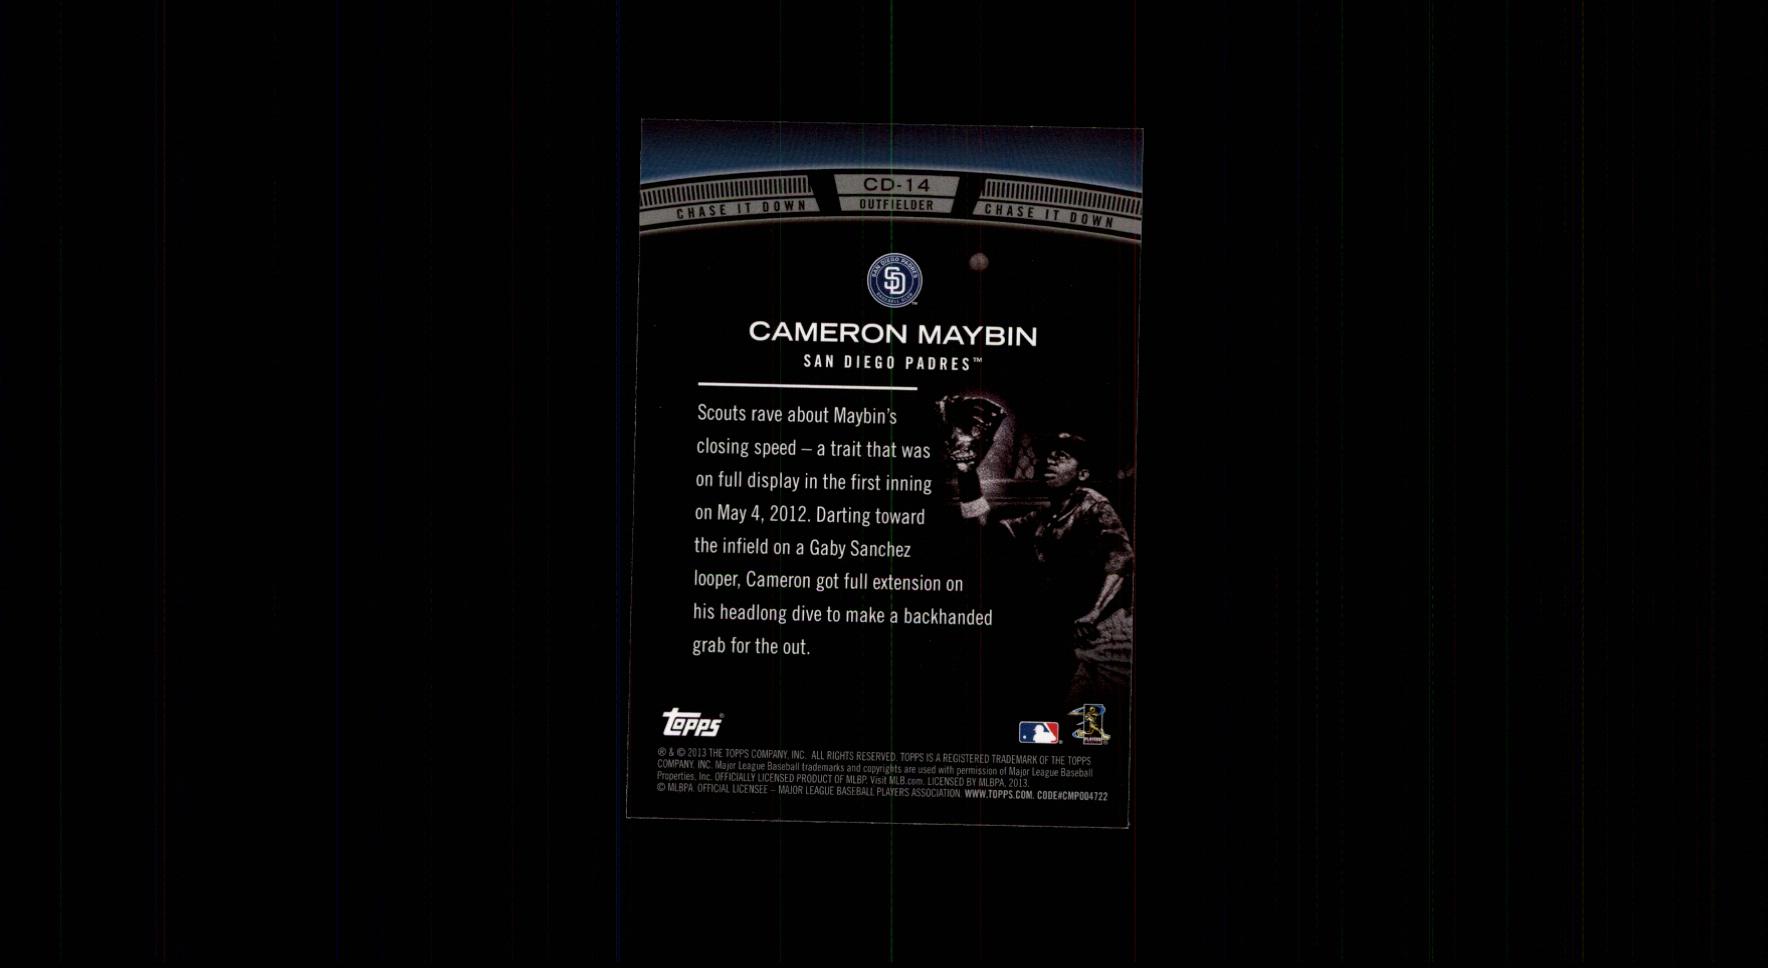 2013 Topps Chase It Down #CD14 Cameron Maybin back image